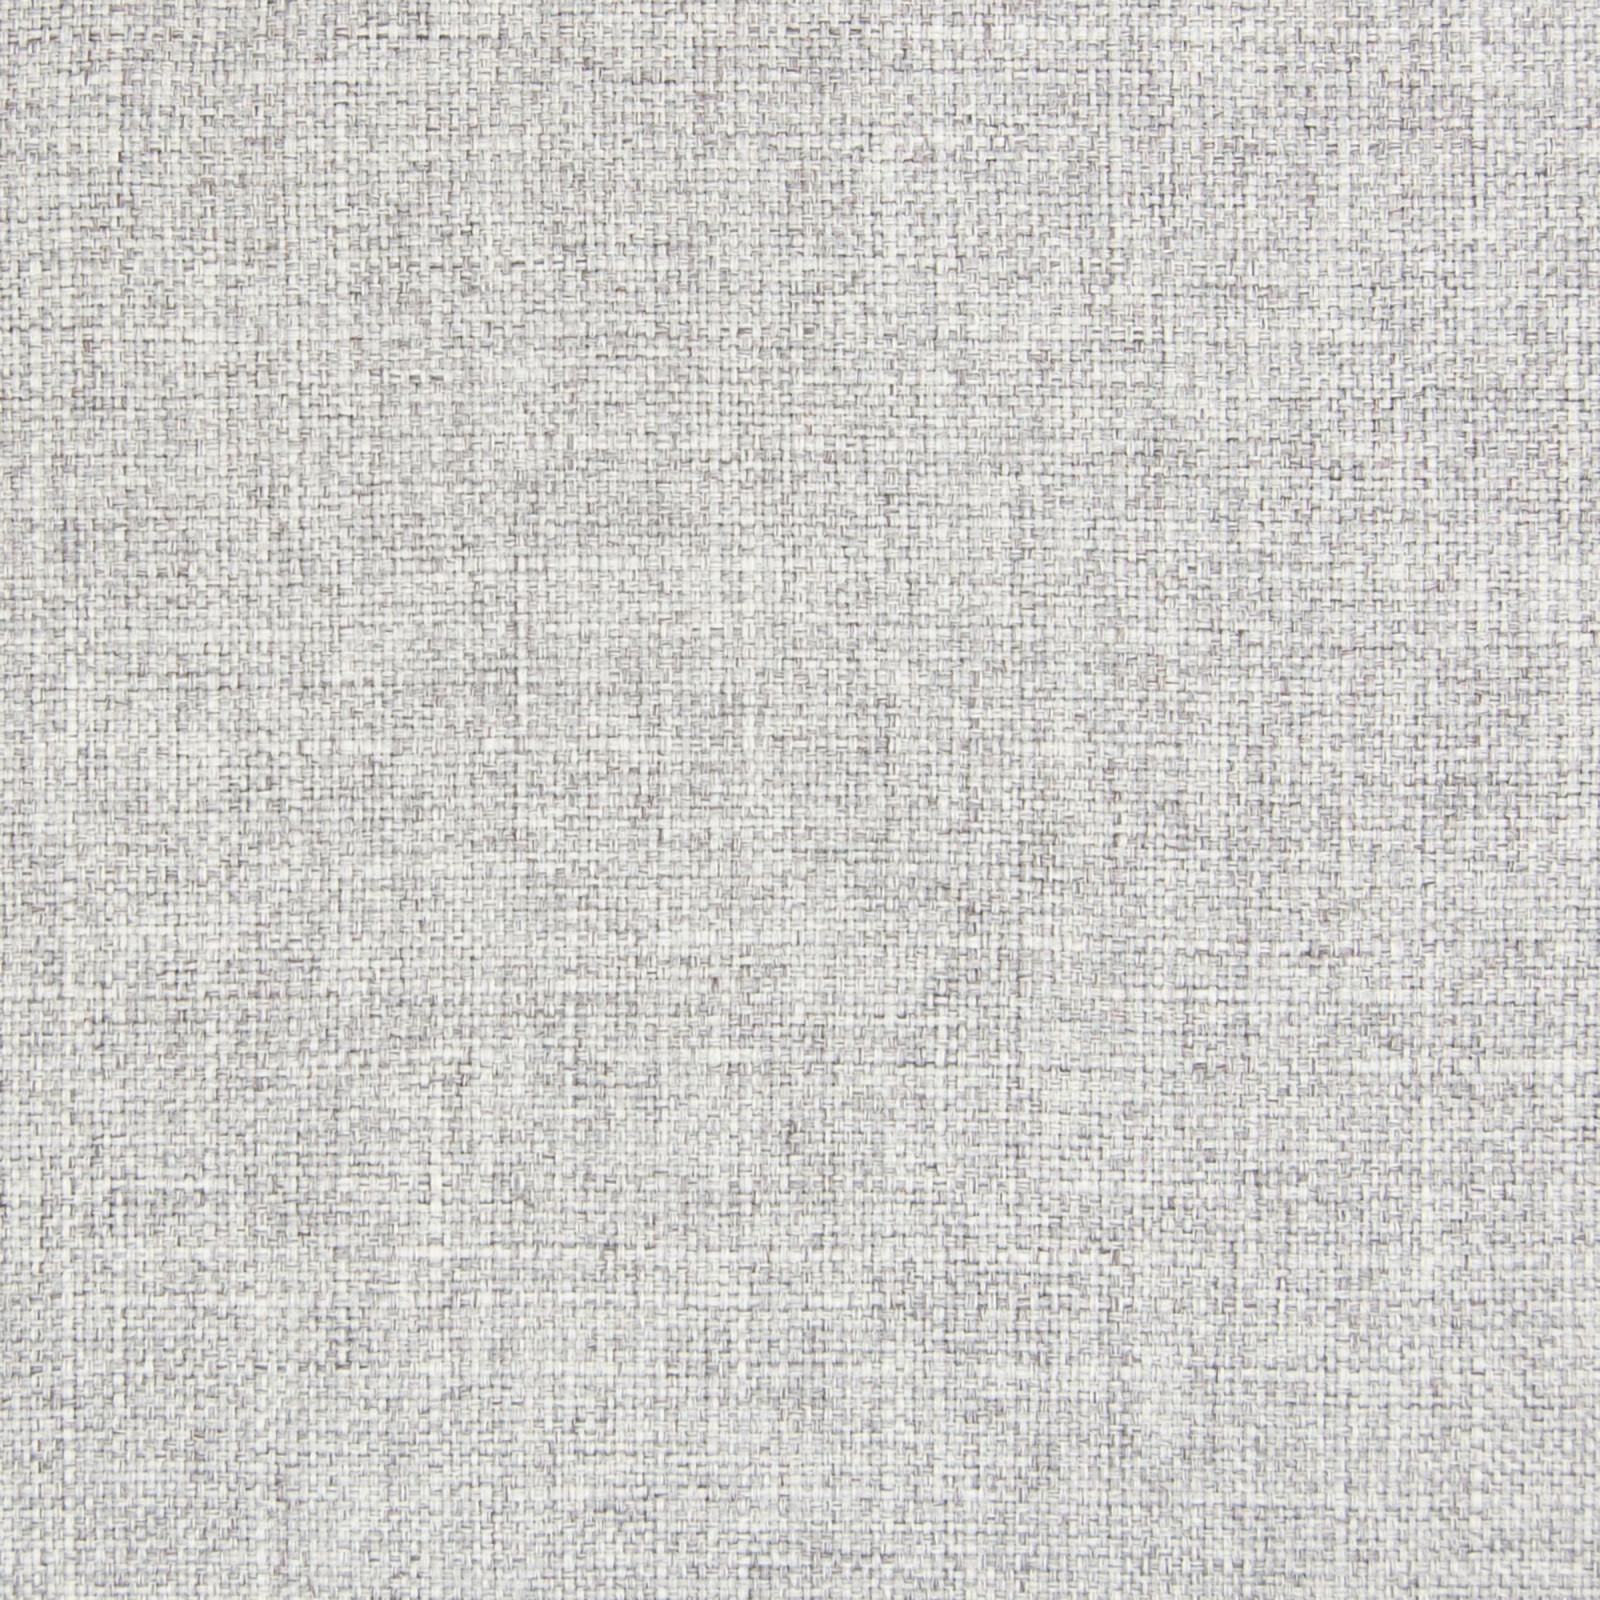 animal print sofas how to fix ripped leather sofa b5848 ash | greenhouse fabrics